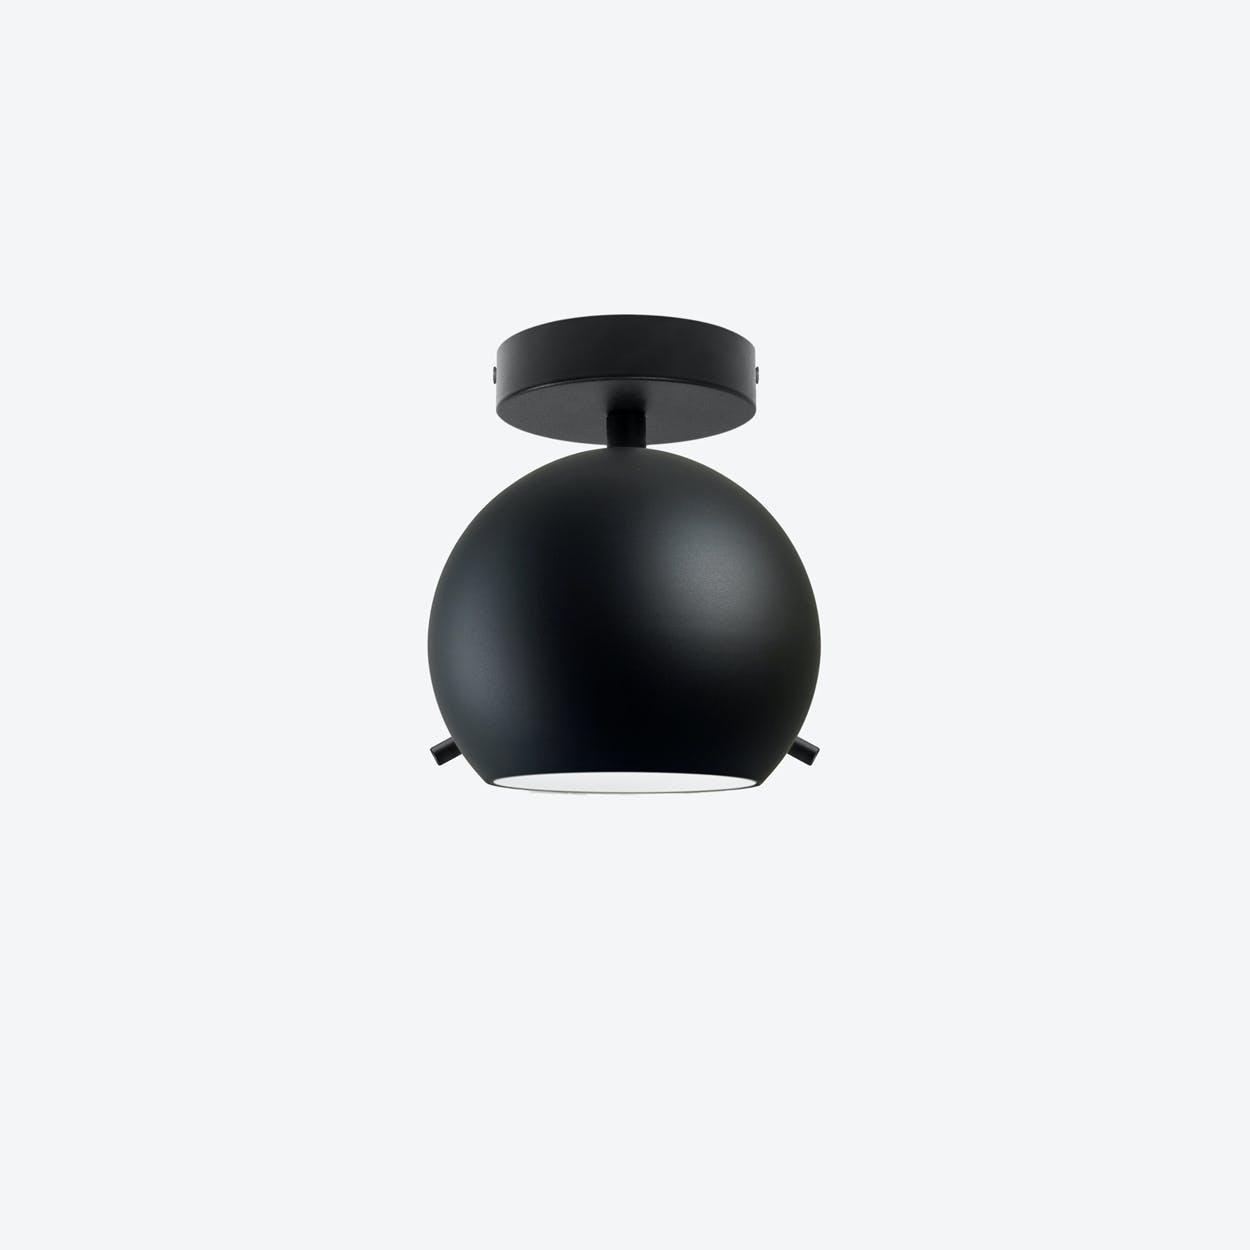 MYOO Ceiling Lamp in Matte Black